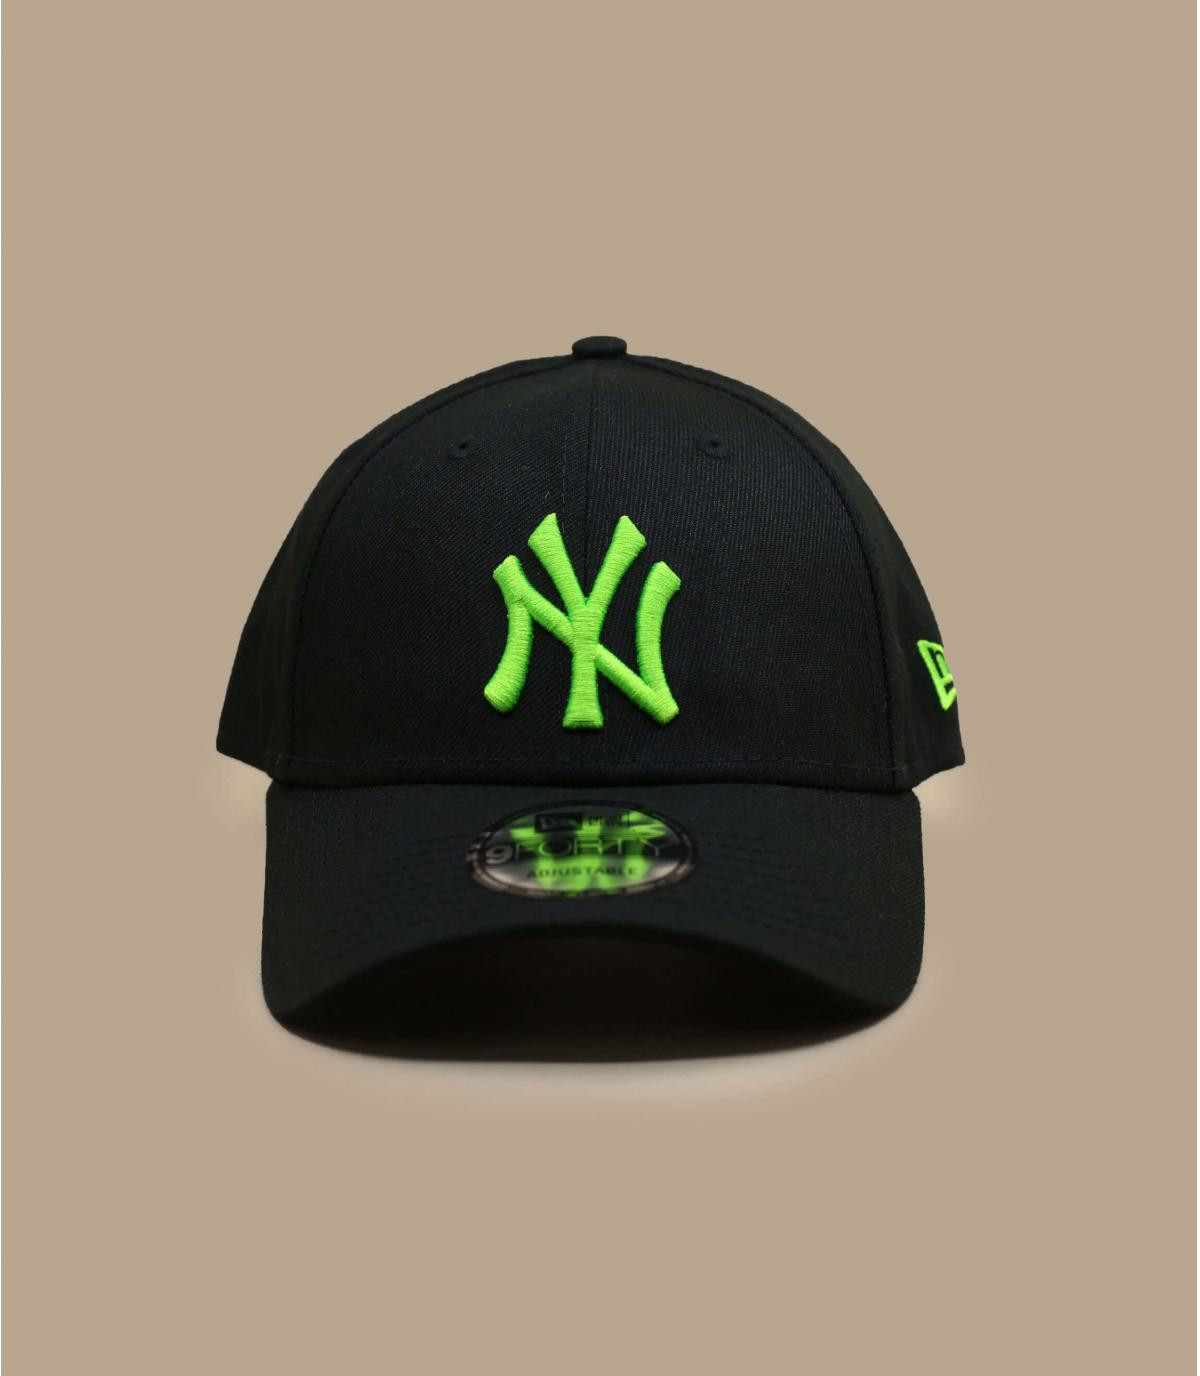 casquette NY noir vert fluo